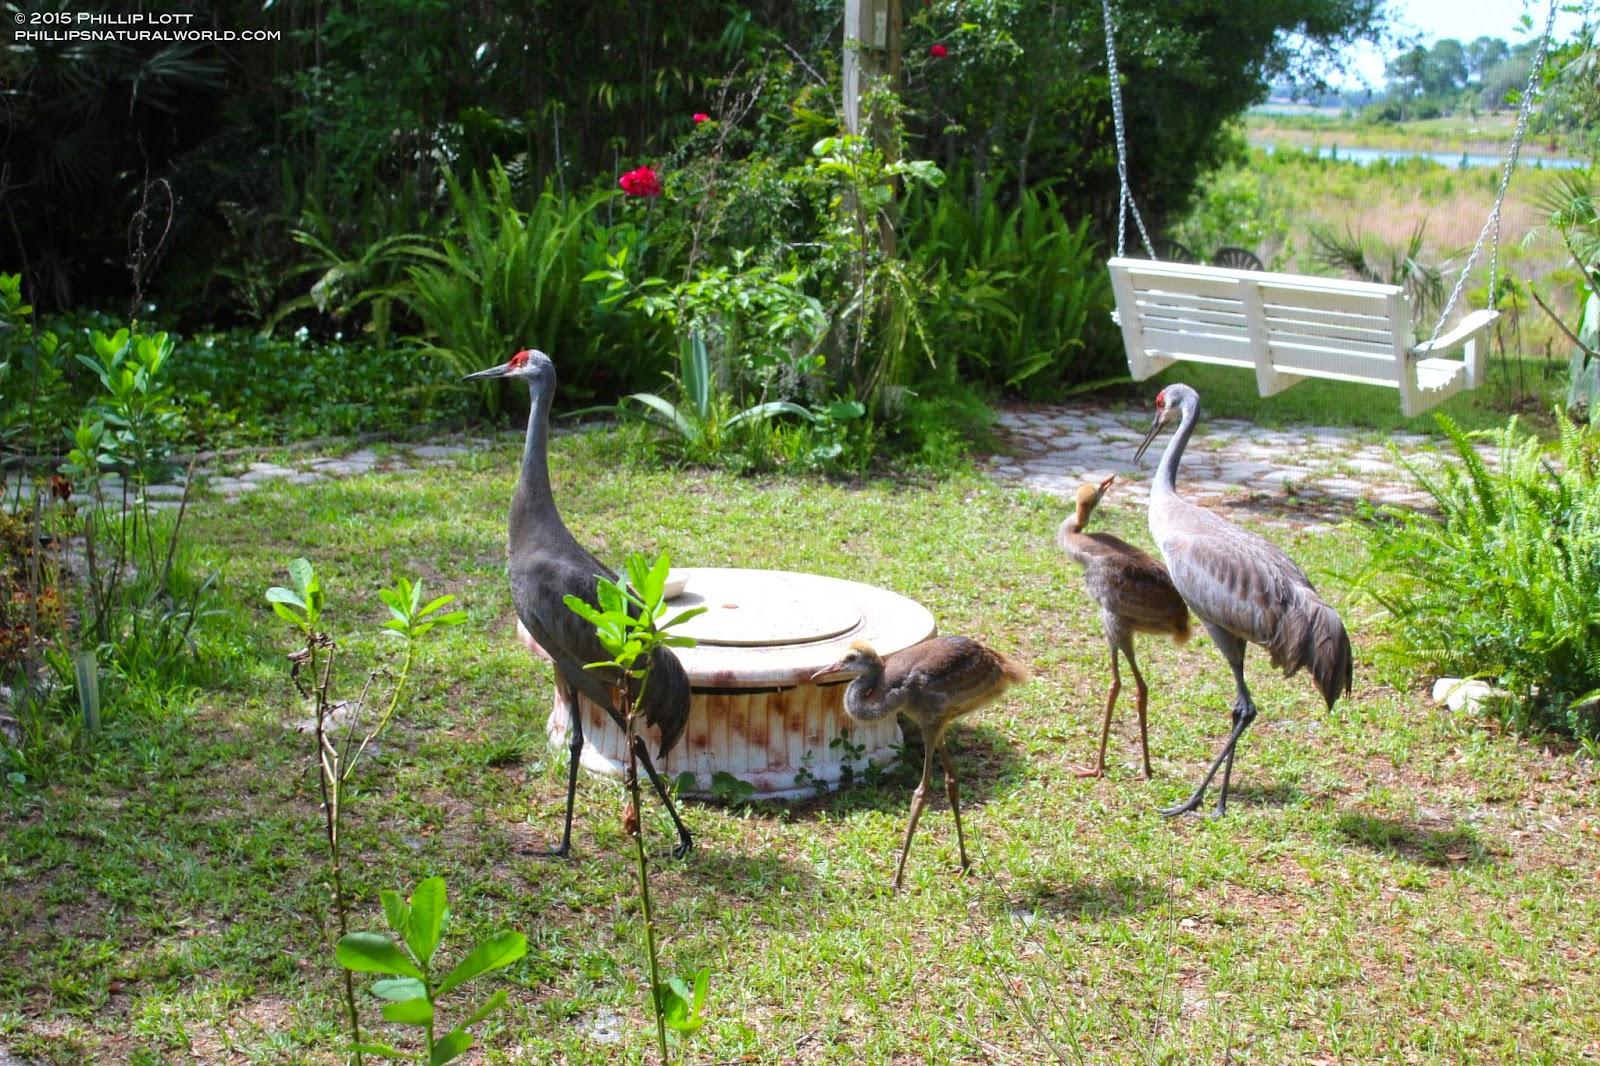 Popular Florida Sandhill Crane Colts (babies) | Phillip's Natural World FI49